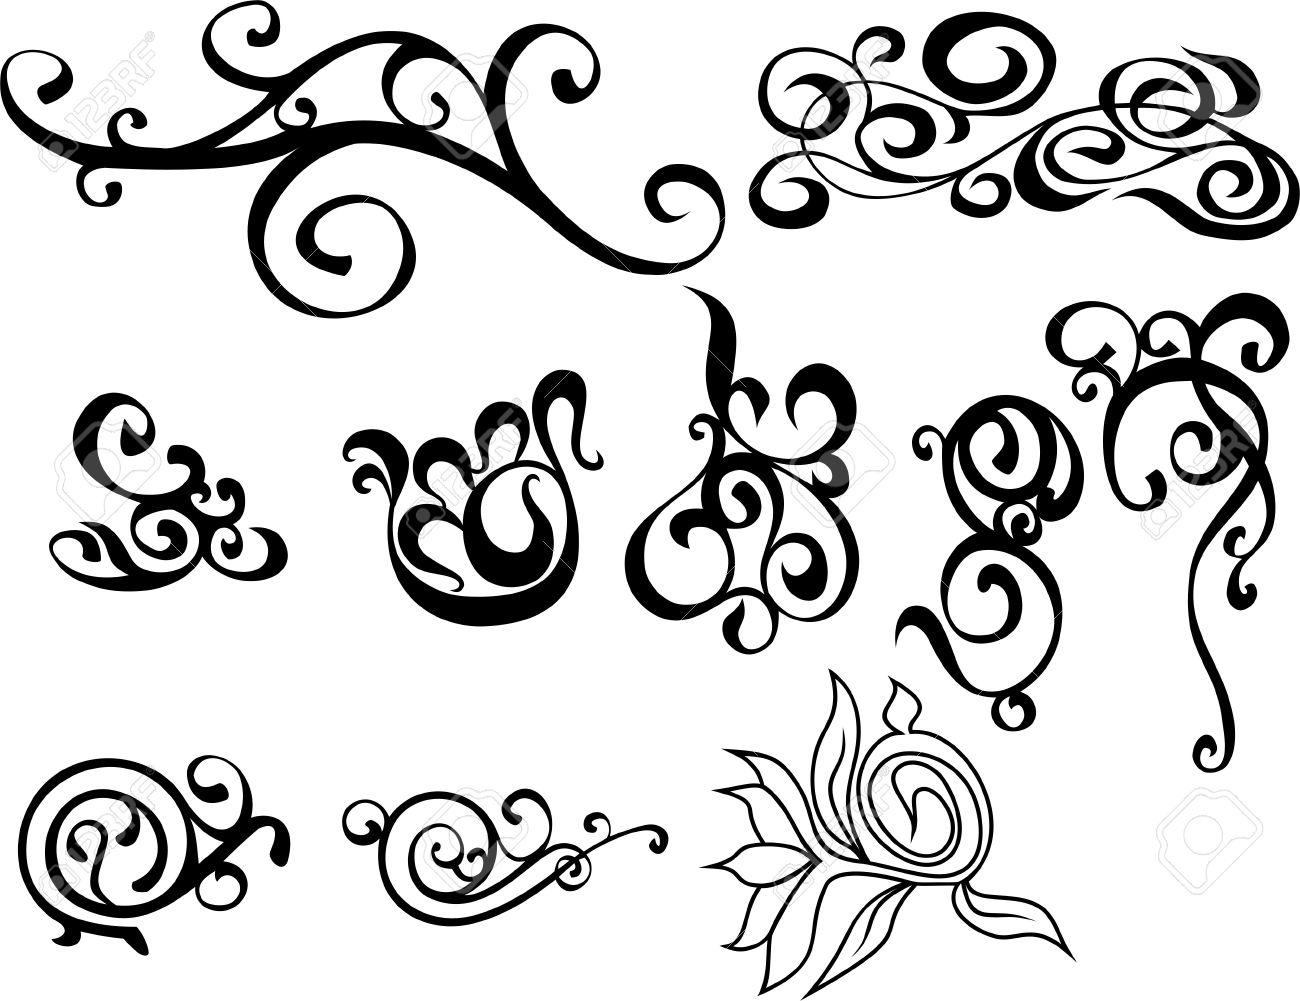 original black and white decorative ornaments royalty free cliparts